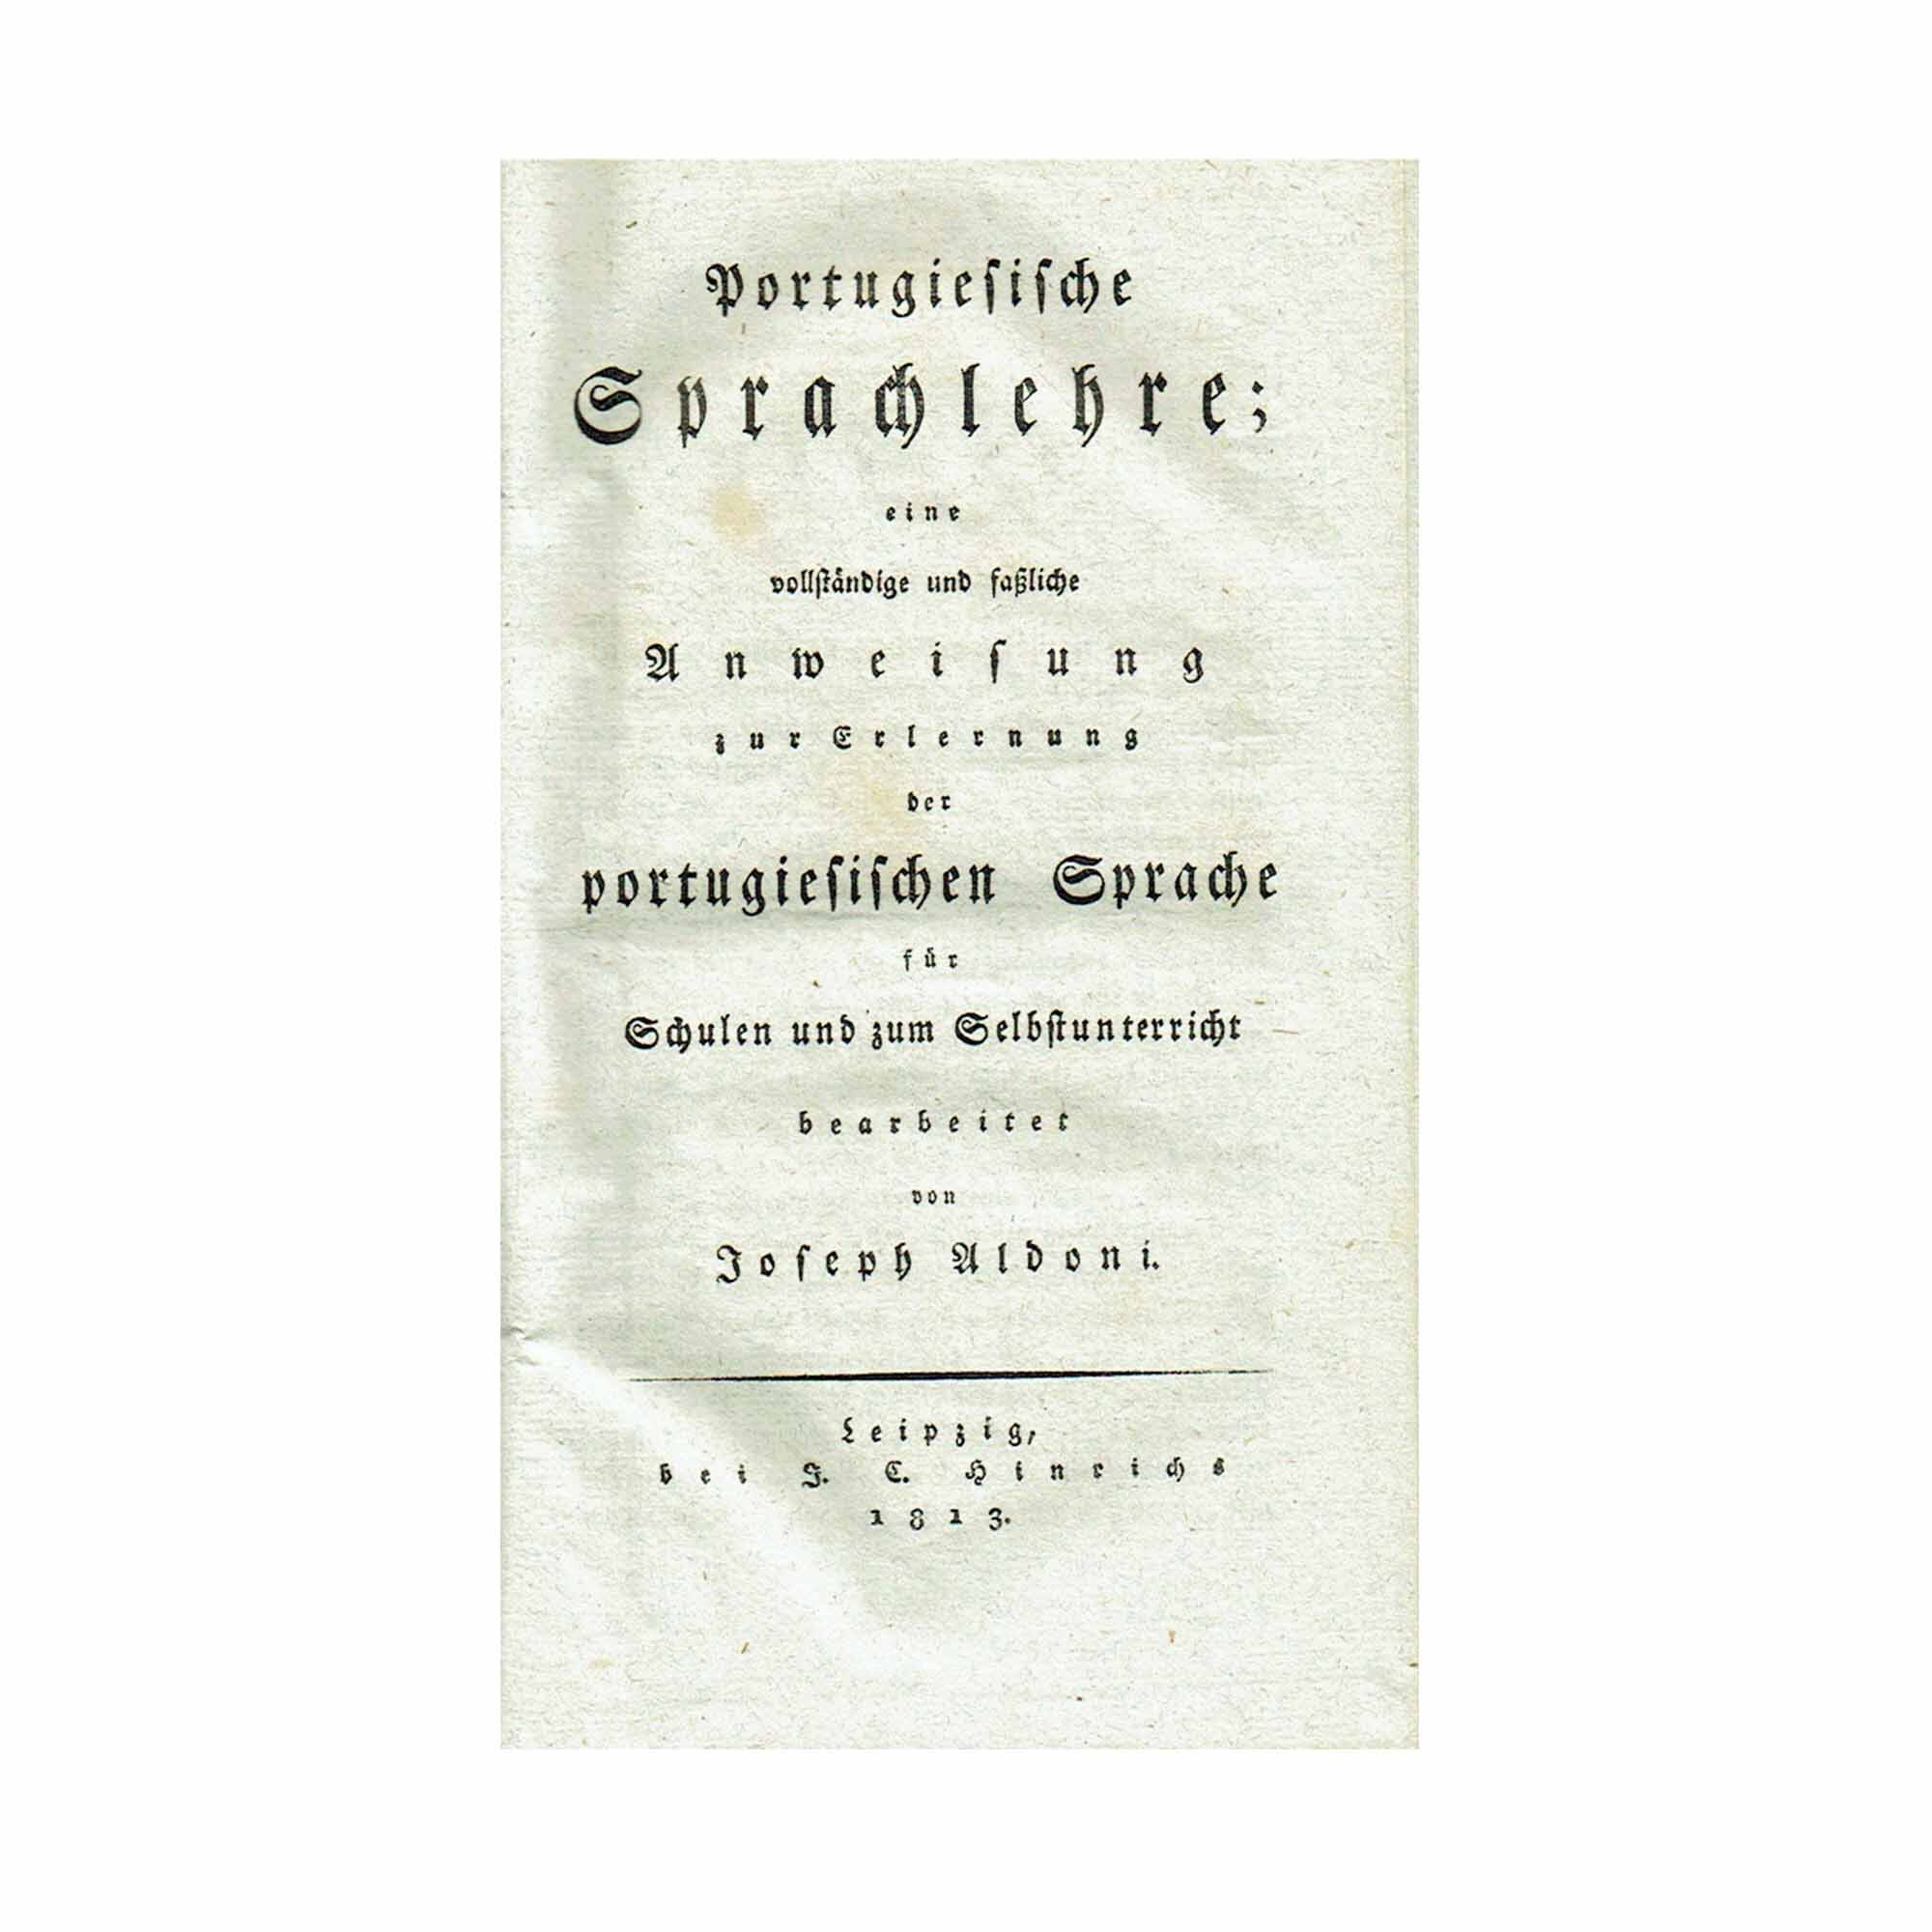 1134 Aldoni Sprachlehre 1813